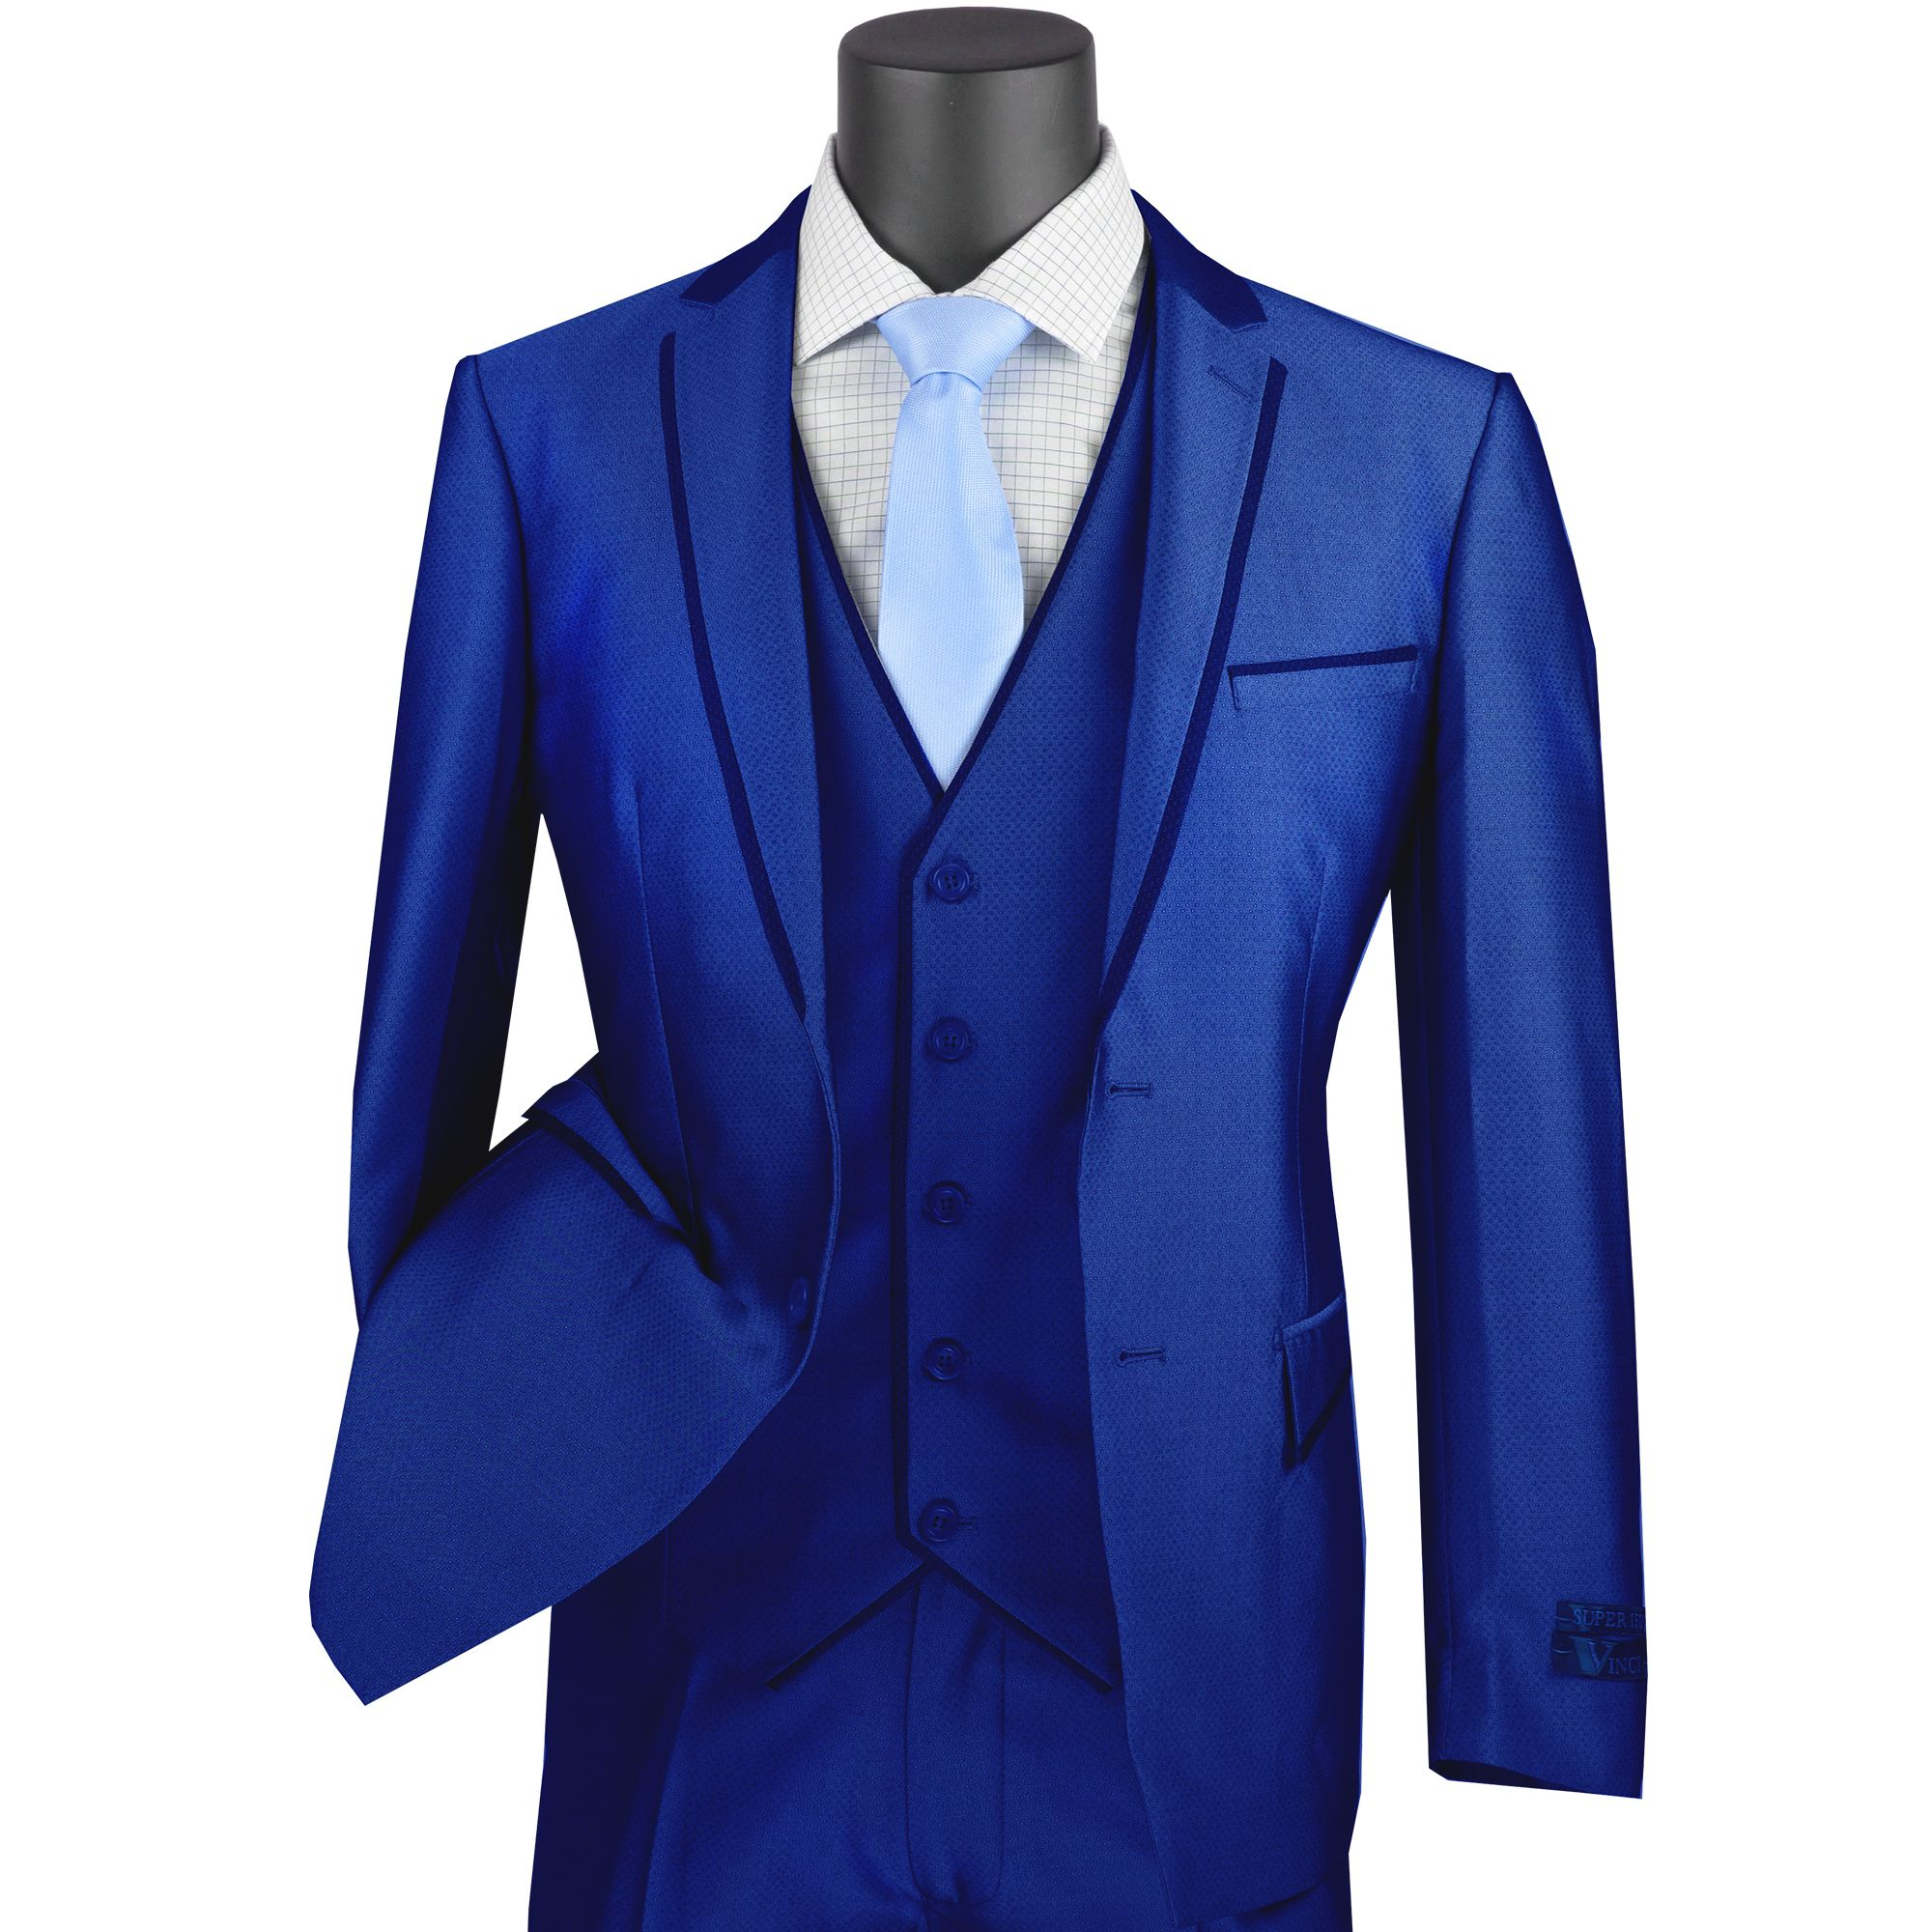 VINCI Men/'s Silver Polka Dot 2 Button Slim Fit Tuxedo w// Shawl Collar Suit NEW